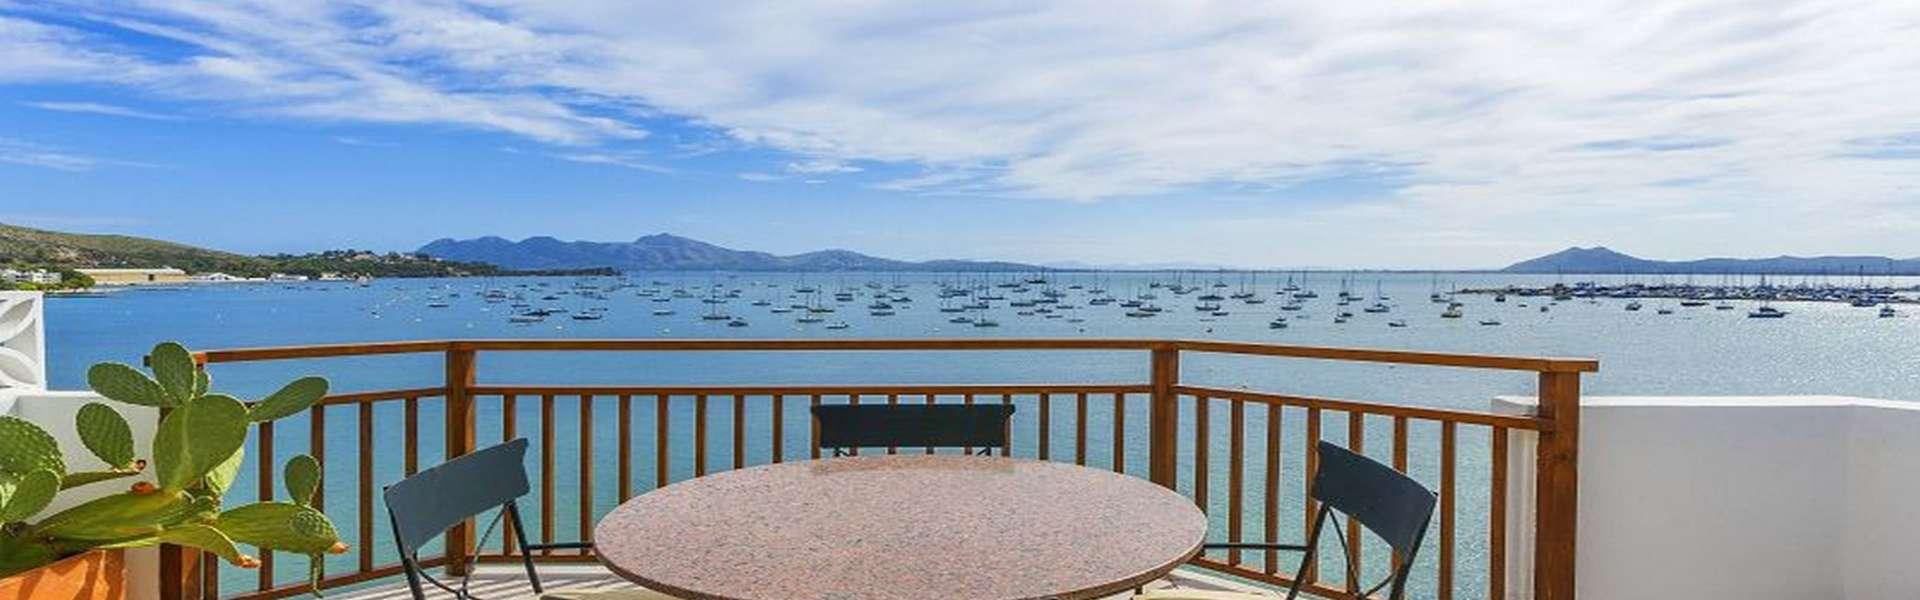 Puerto Pollensa – Luxus Penthouse in erster Linie